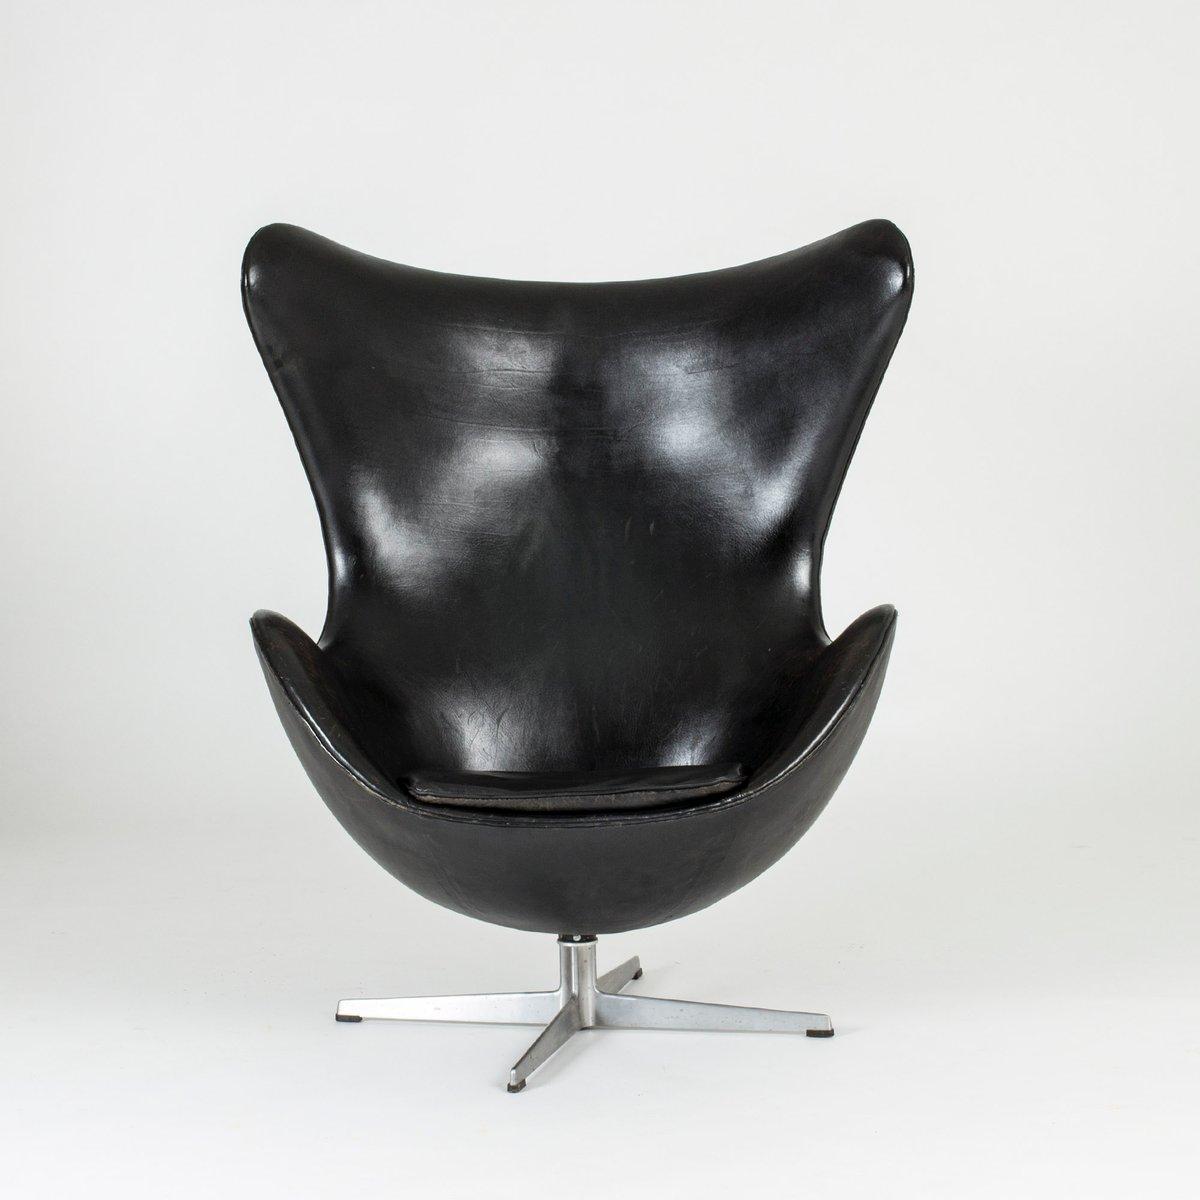 Poltrona Egg Di Arne Jacobsen Per Fritz Hansen Anni 60 In Vendita